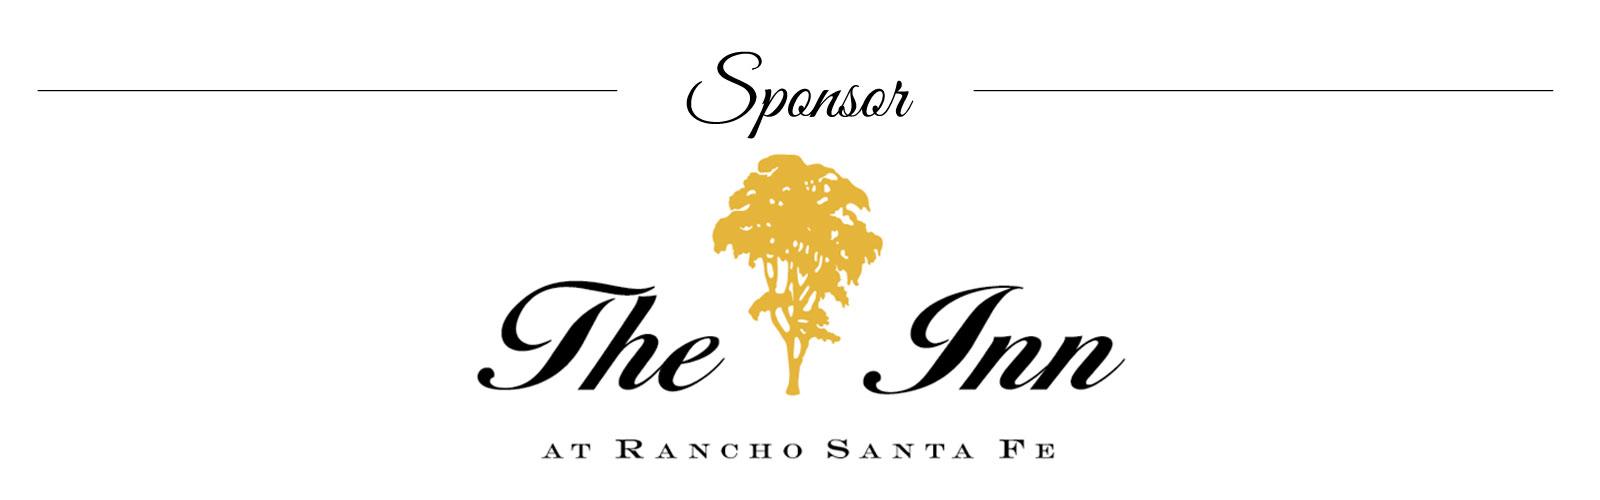 sponsor-theInnatRSF